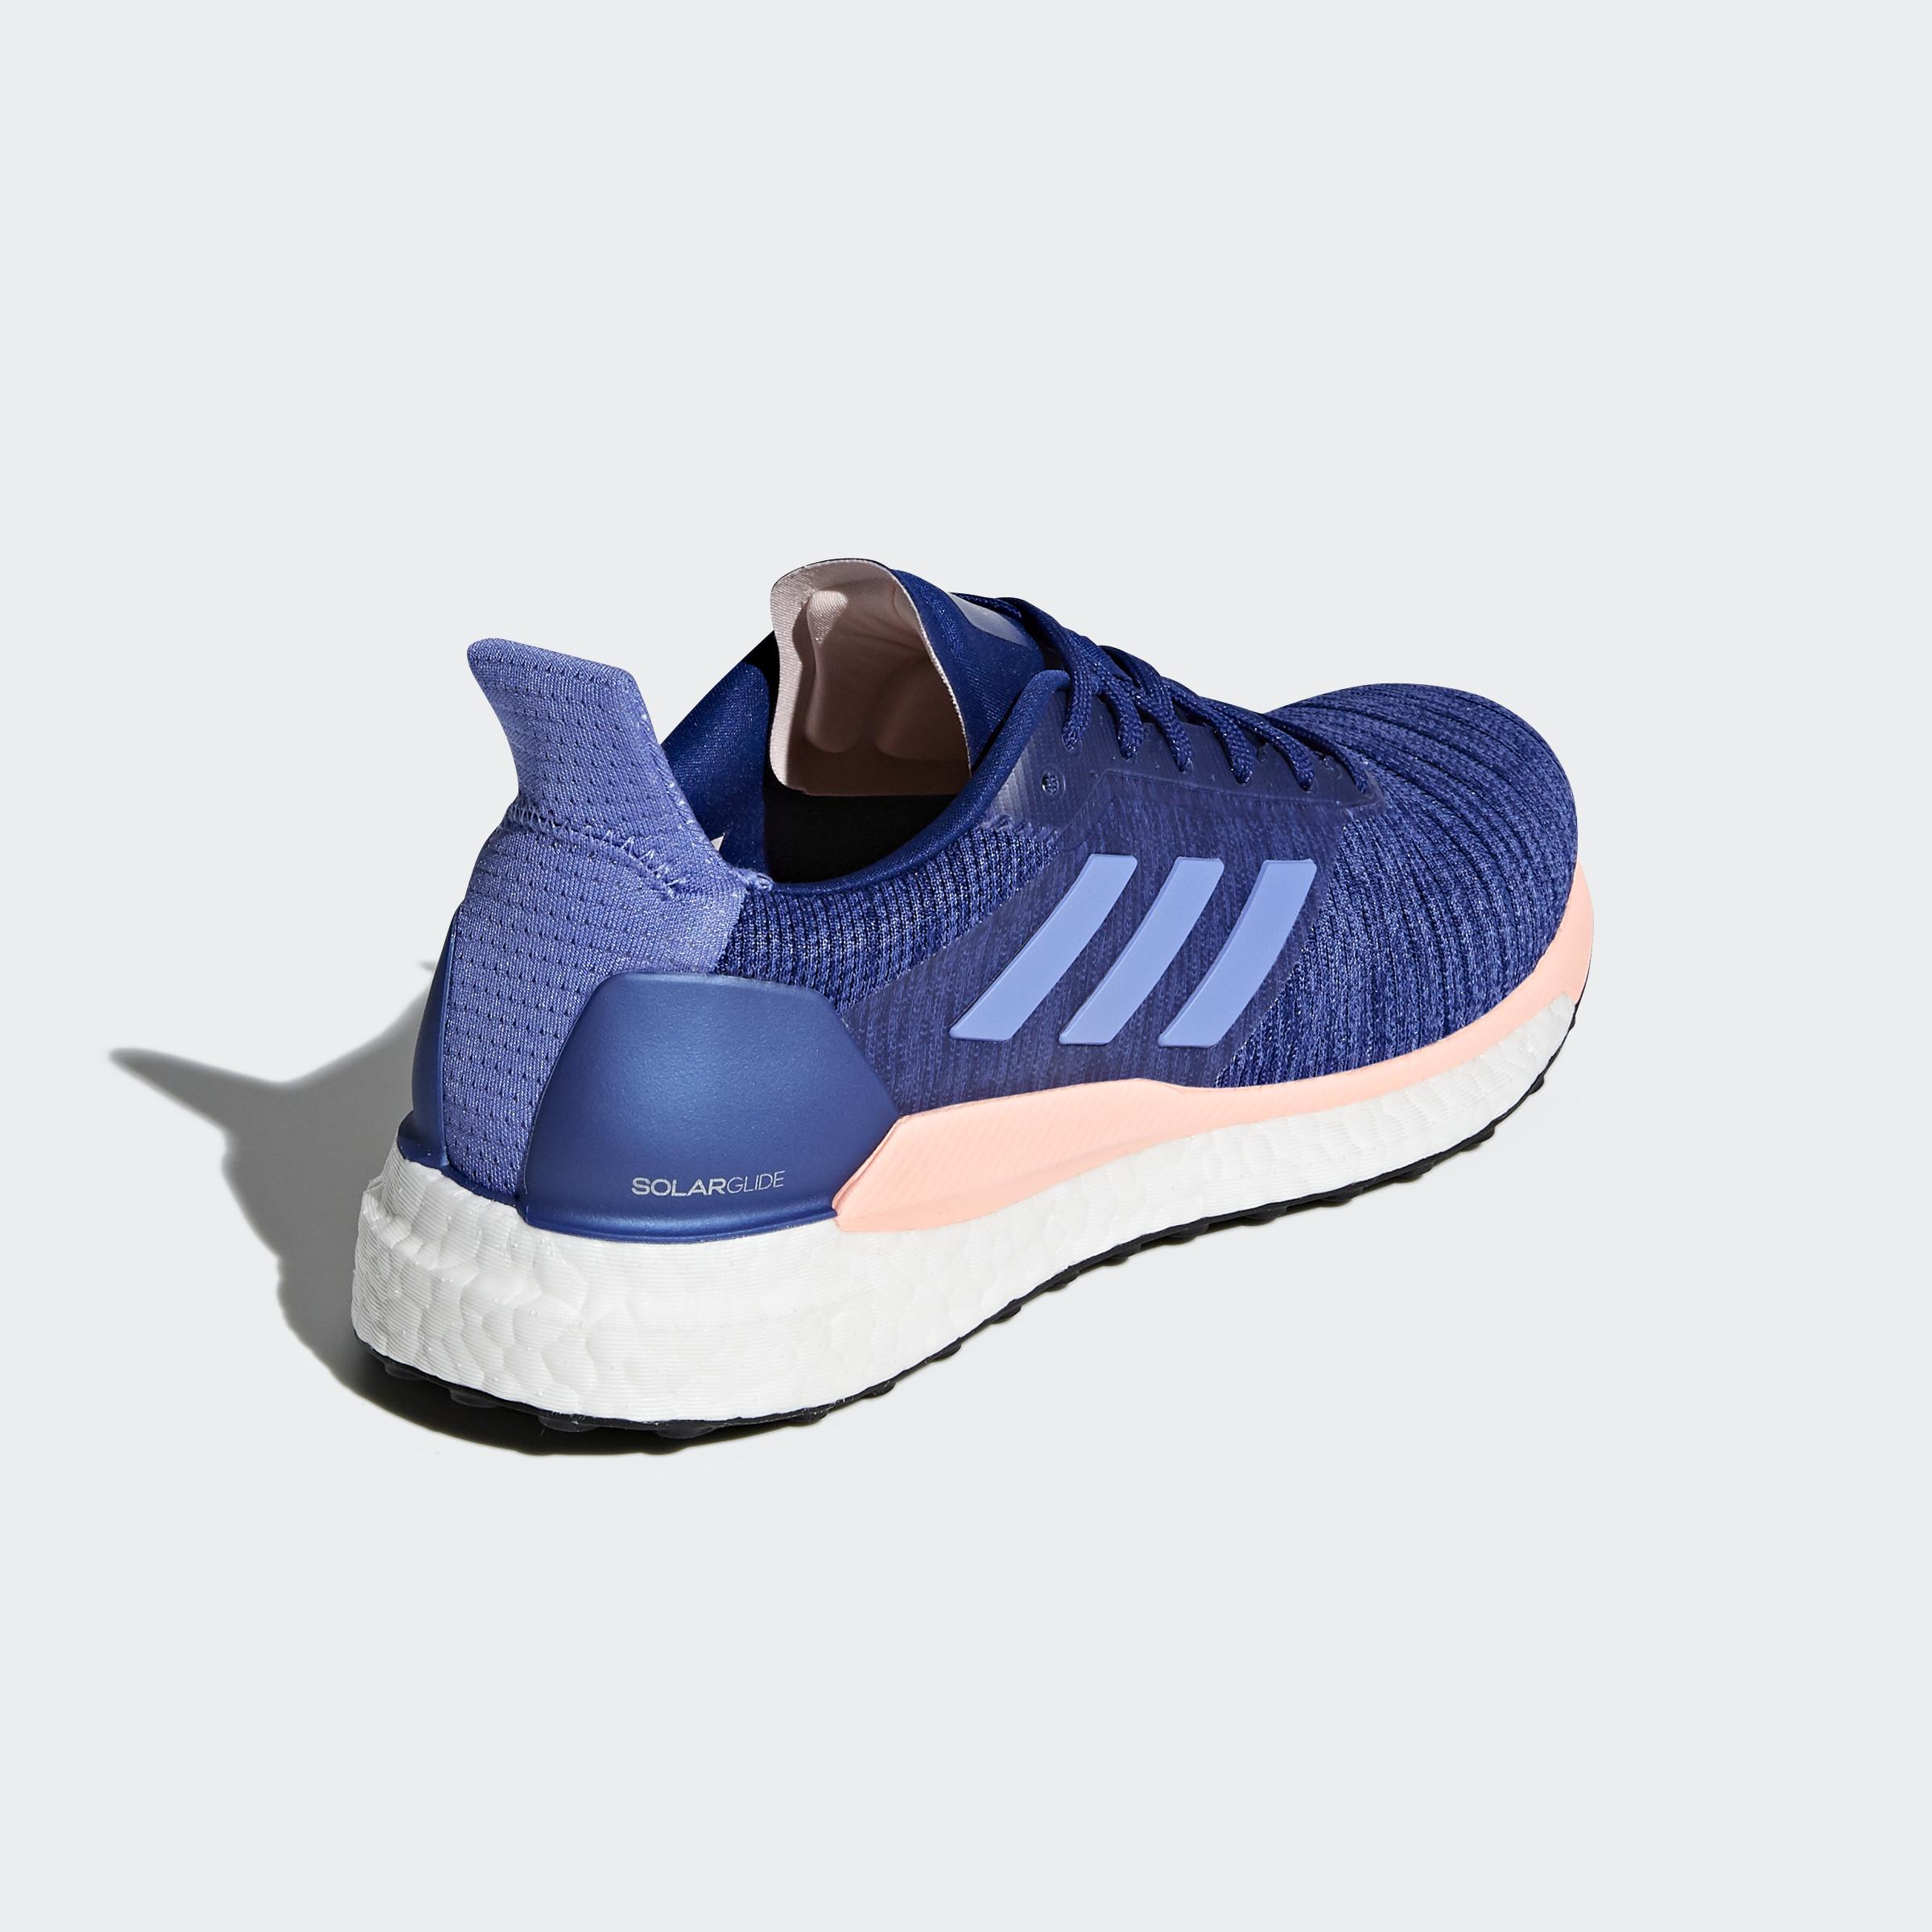 Chaussures De Glisse Solaire RmyEY7